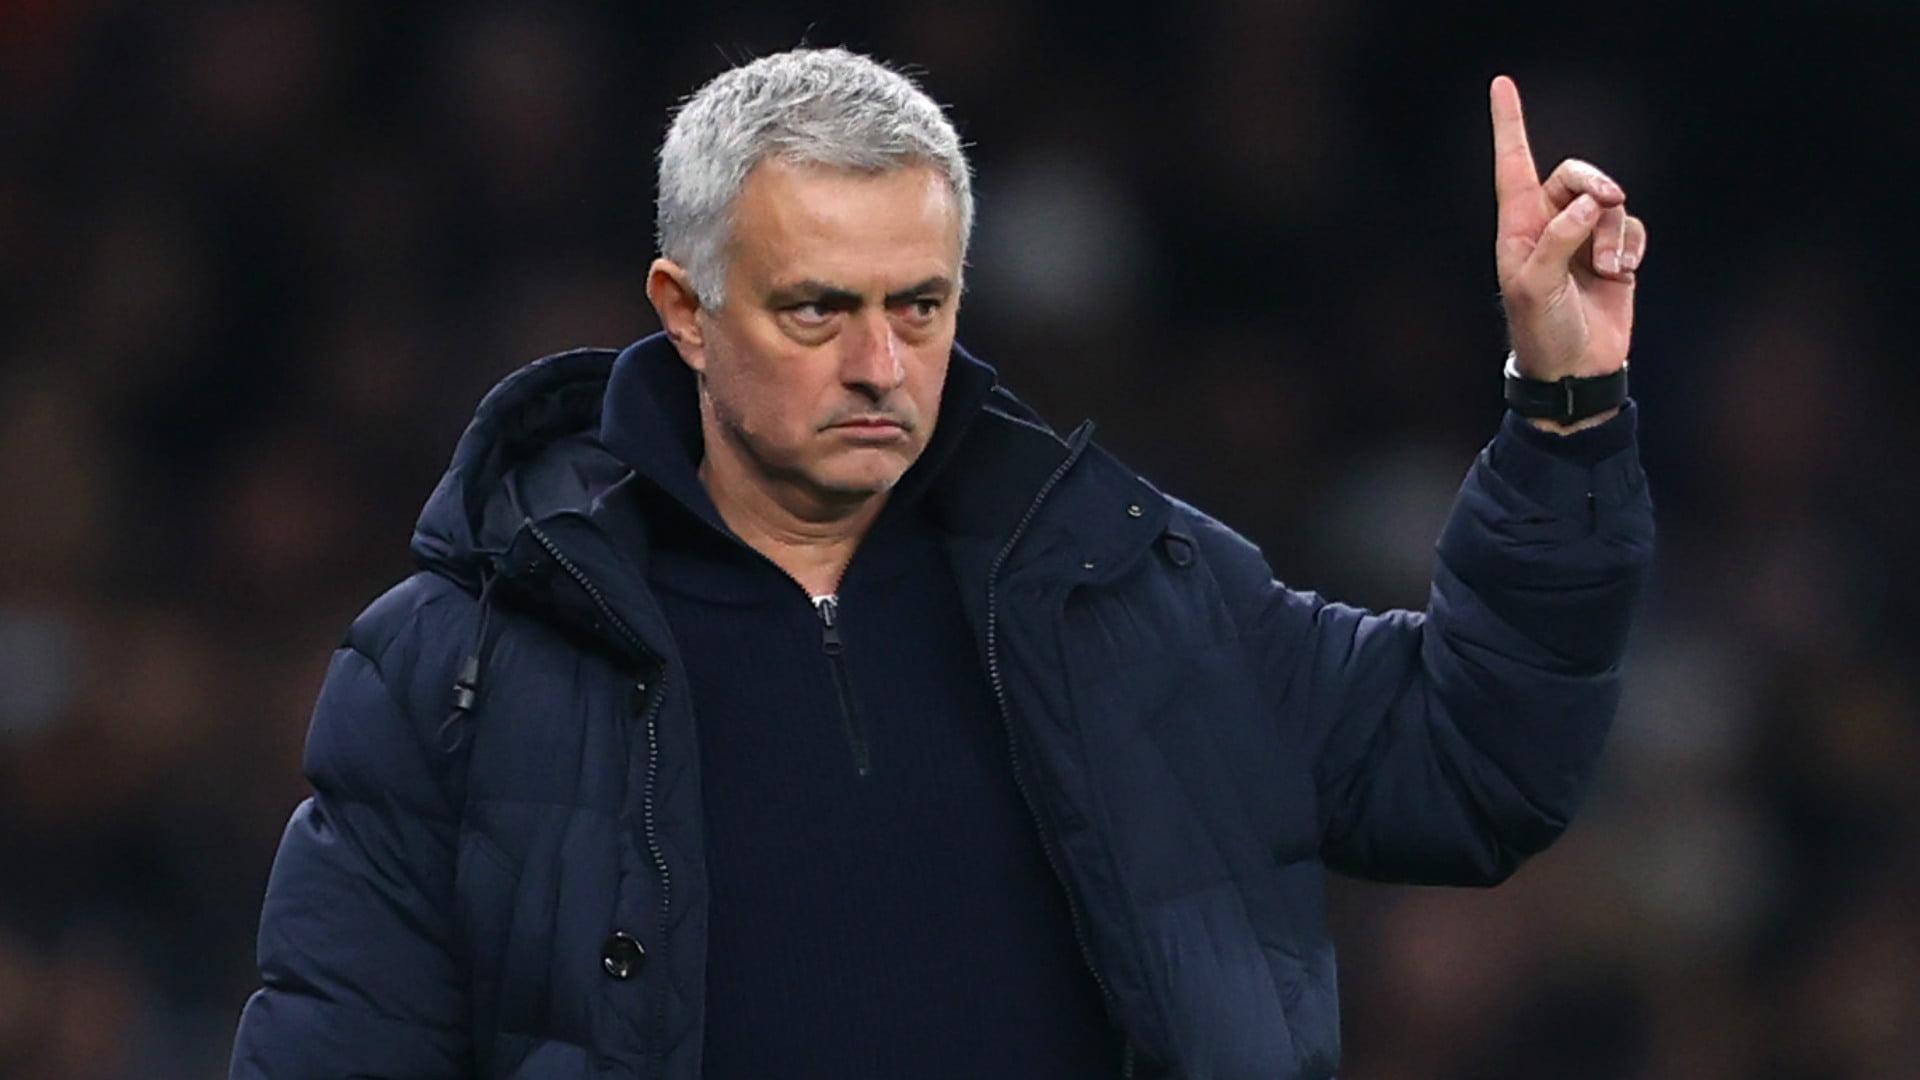 Europa League: Mourinho reacts to Tottenham draw against Dinamo